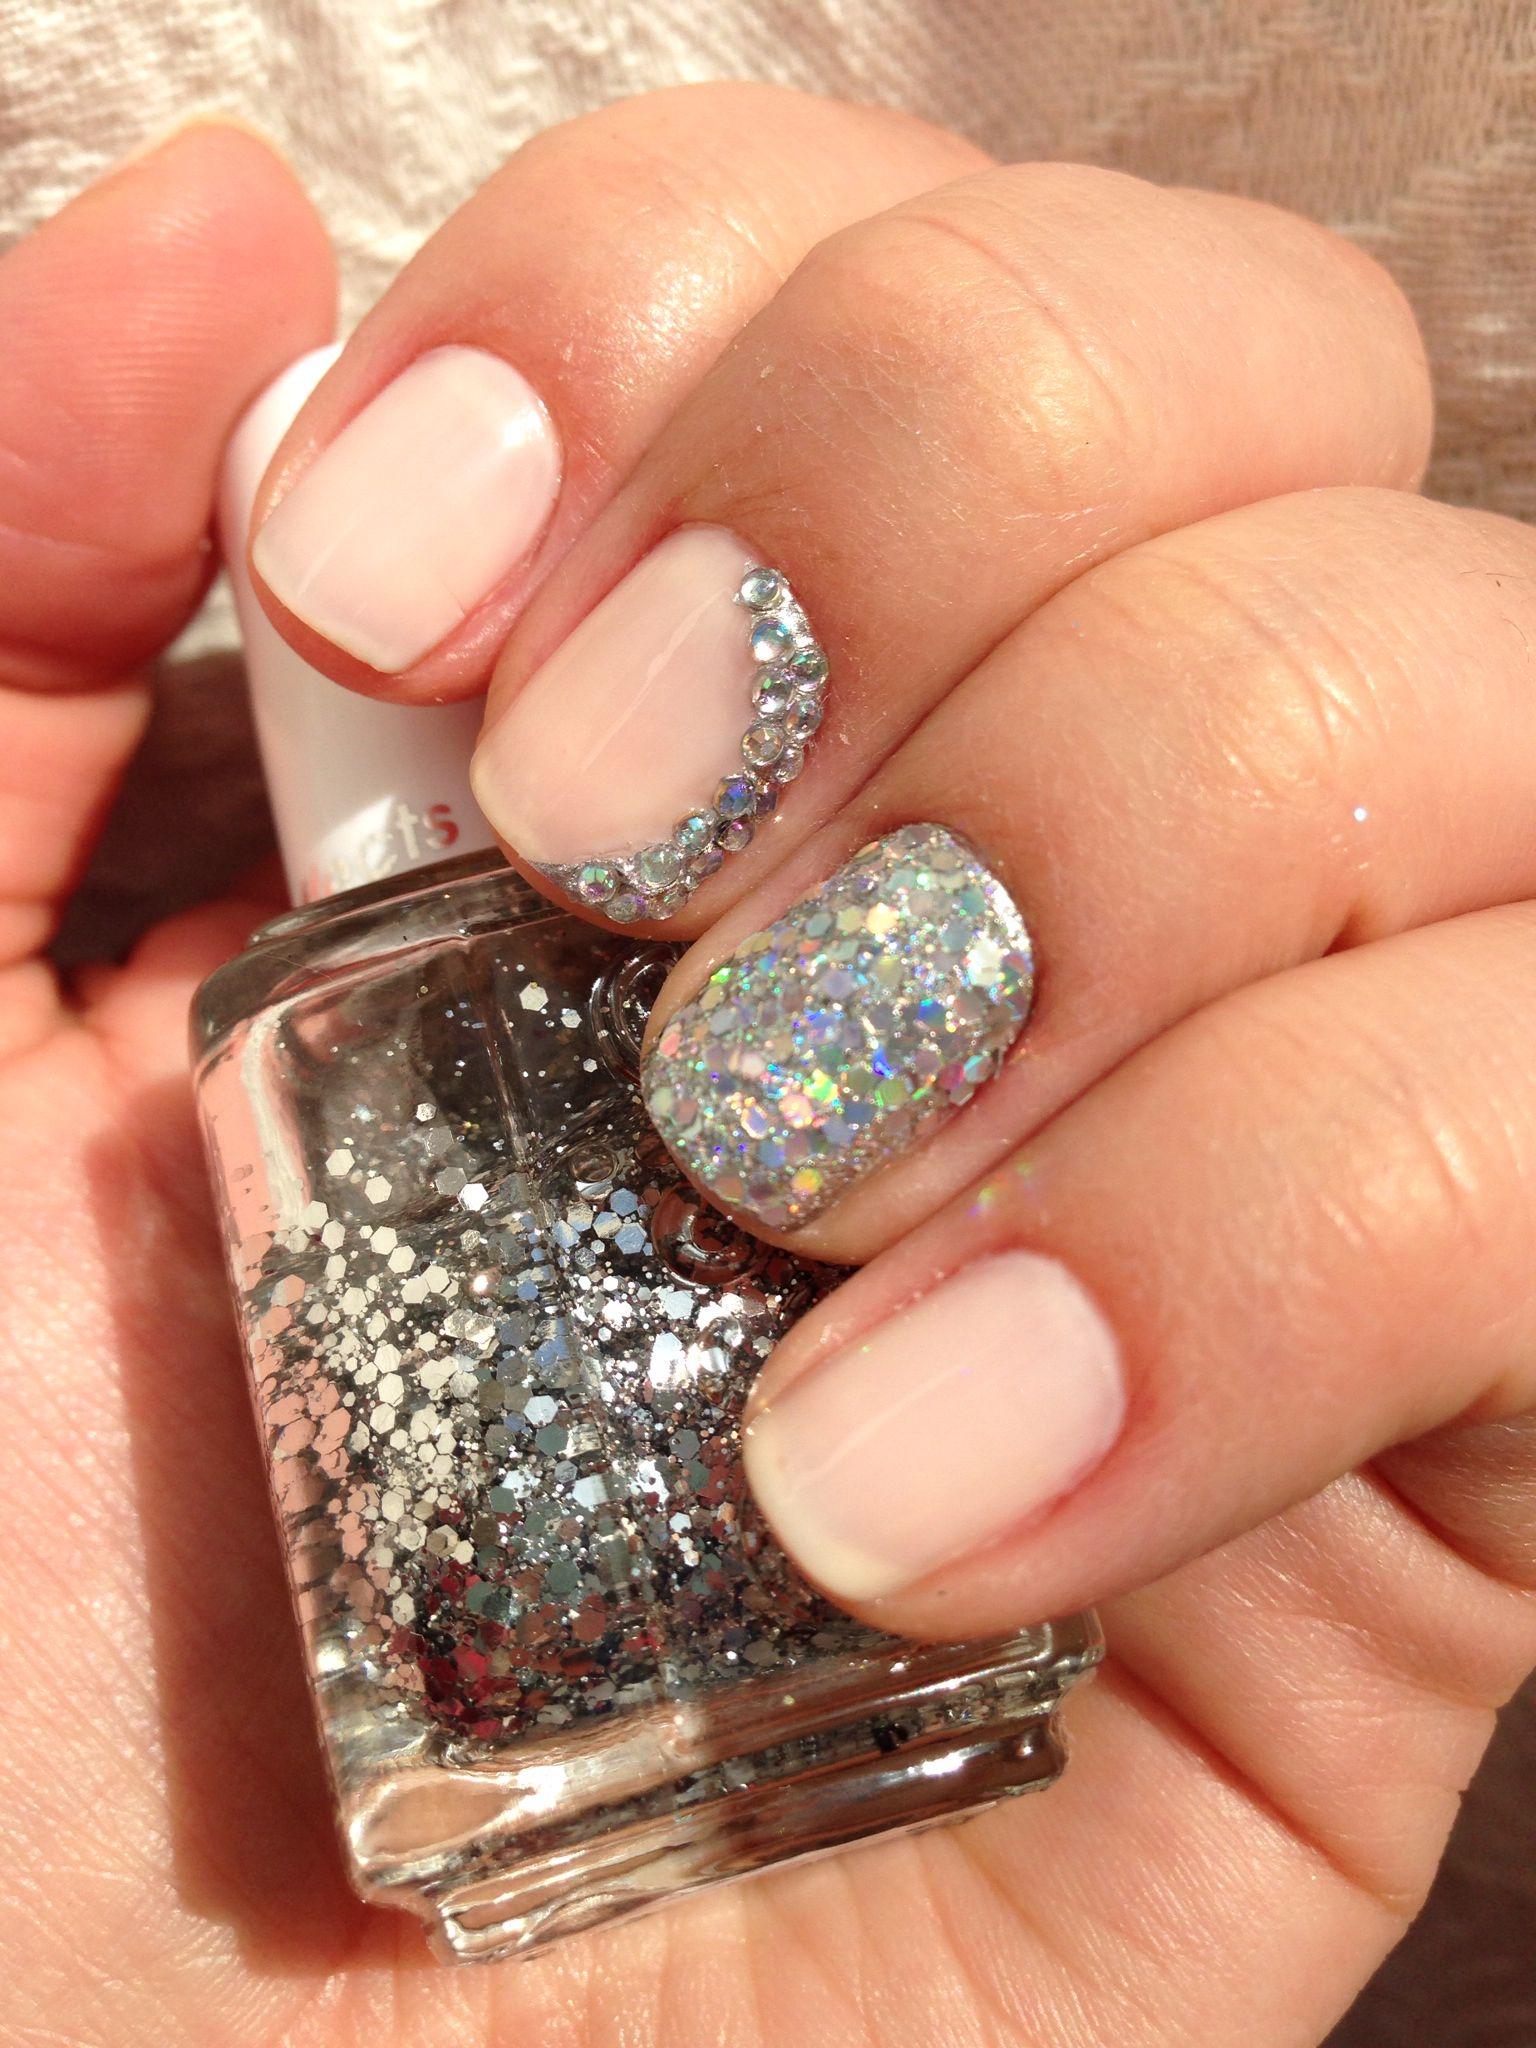 Diva nails! | Claudia's Nails | Diva nails, Nails, Nail ...